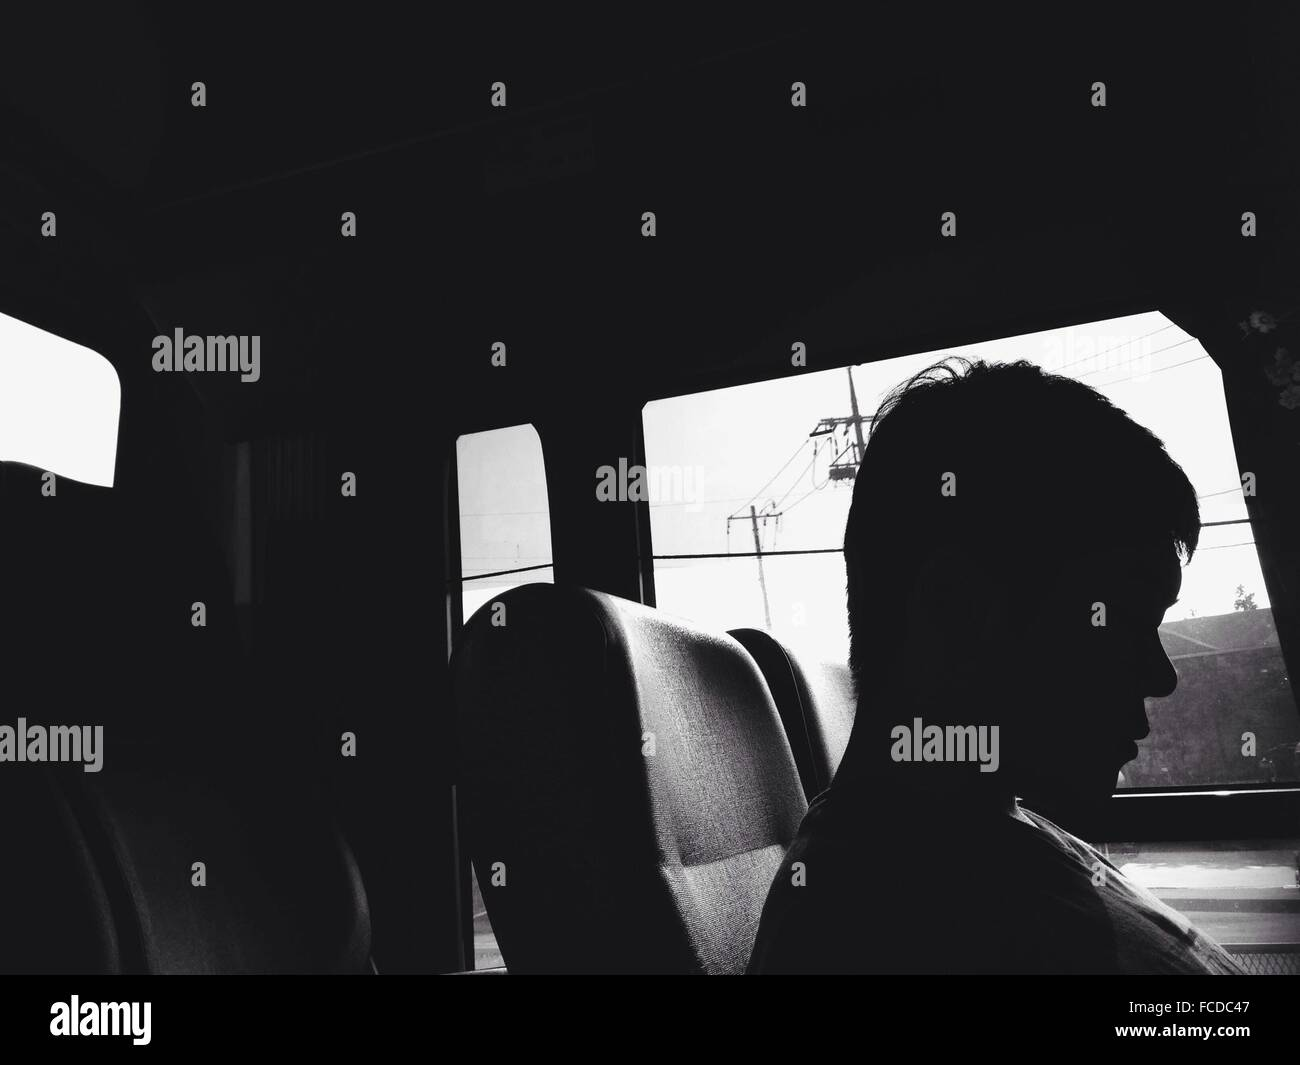 Silueta de hombre sentado dentro del coche Imagen De Stock